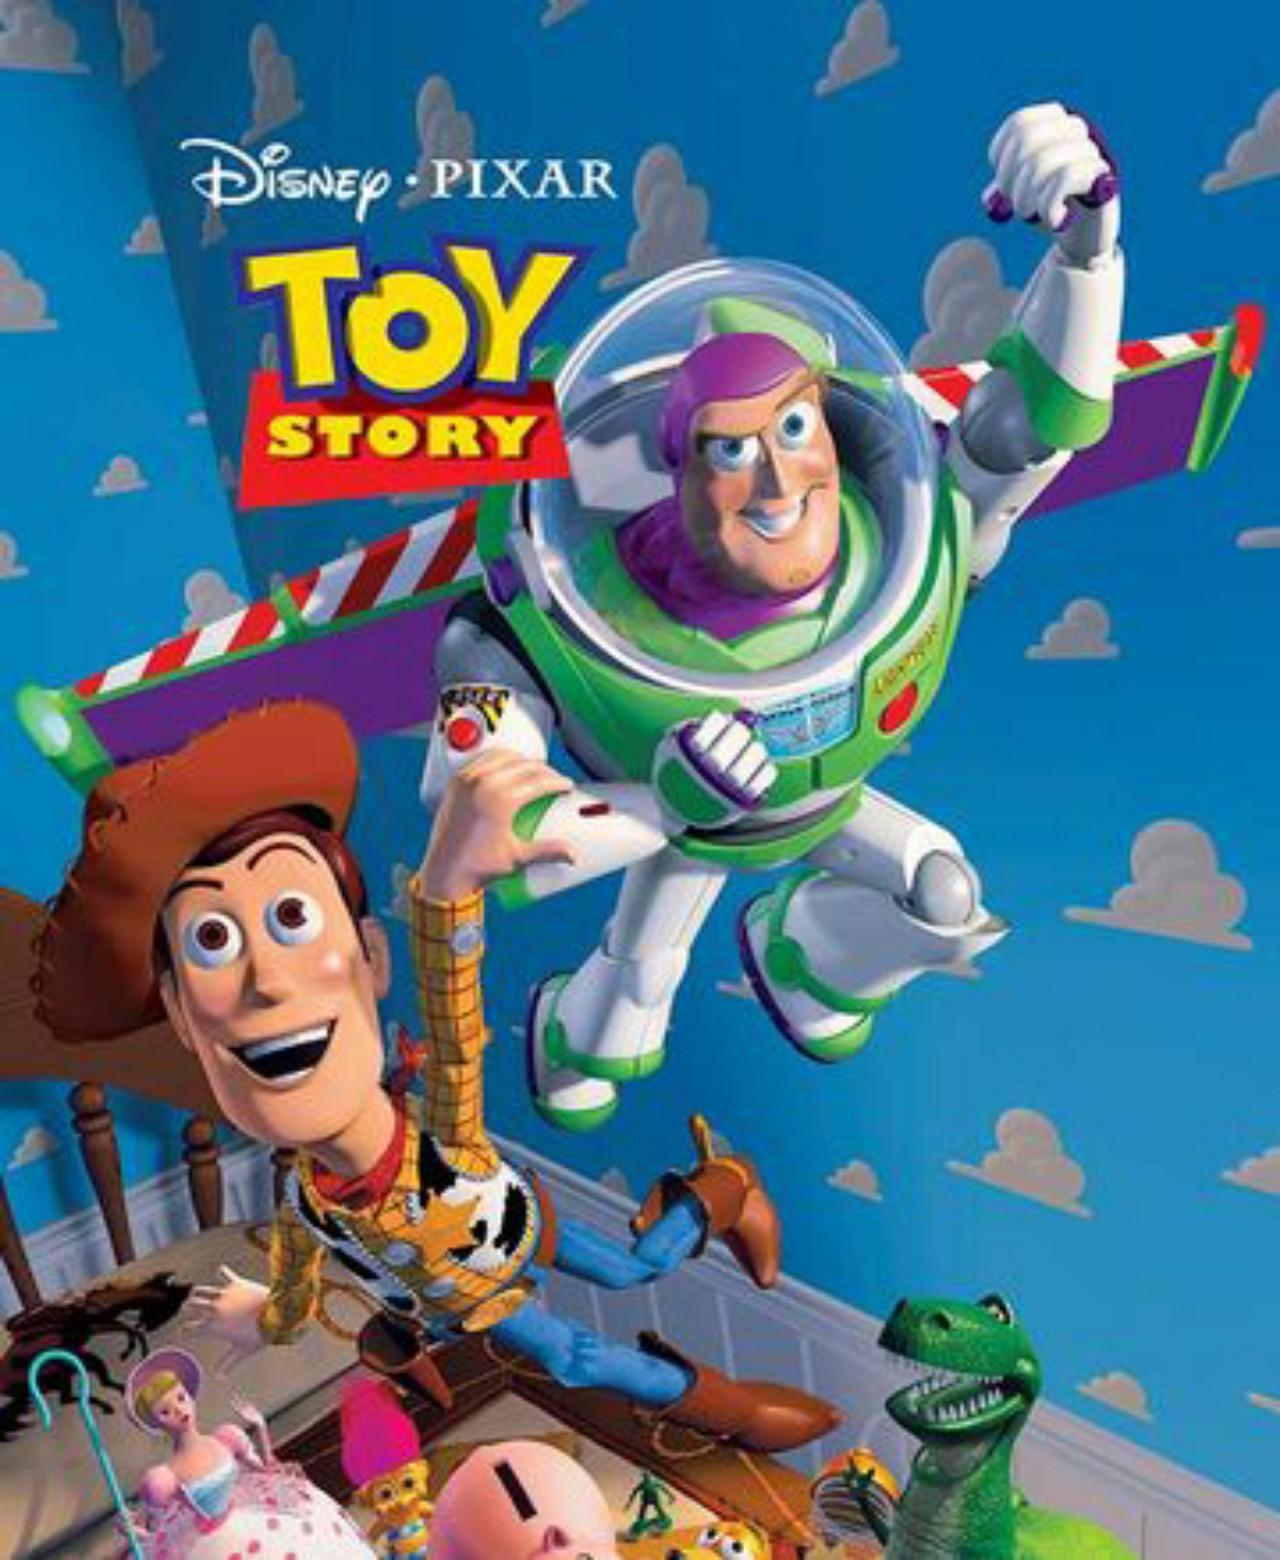 Buzz Lightyear and Sheriff Woody